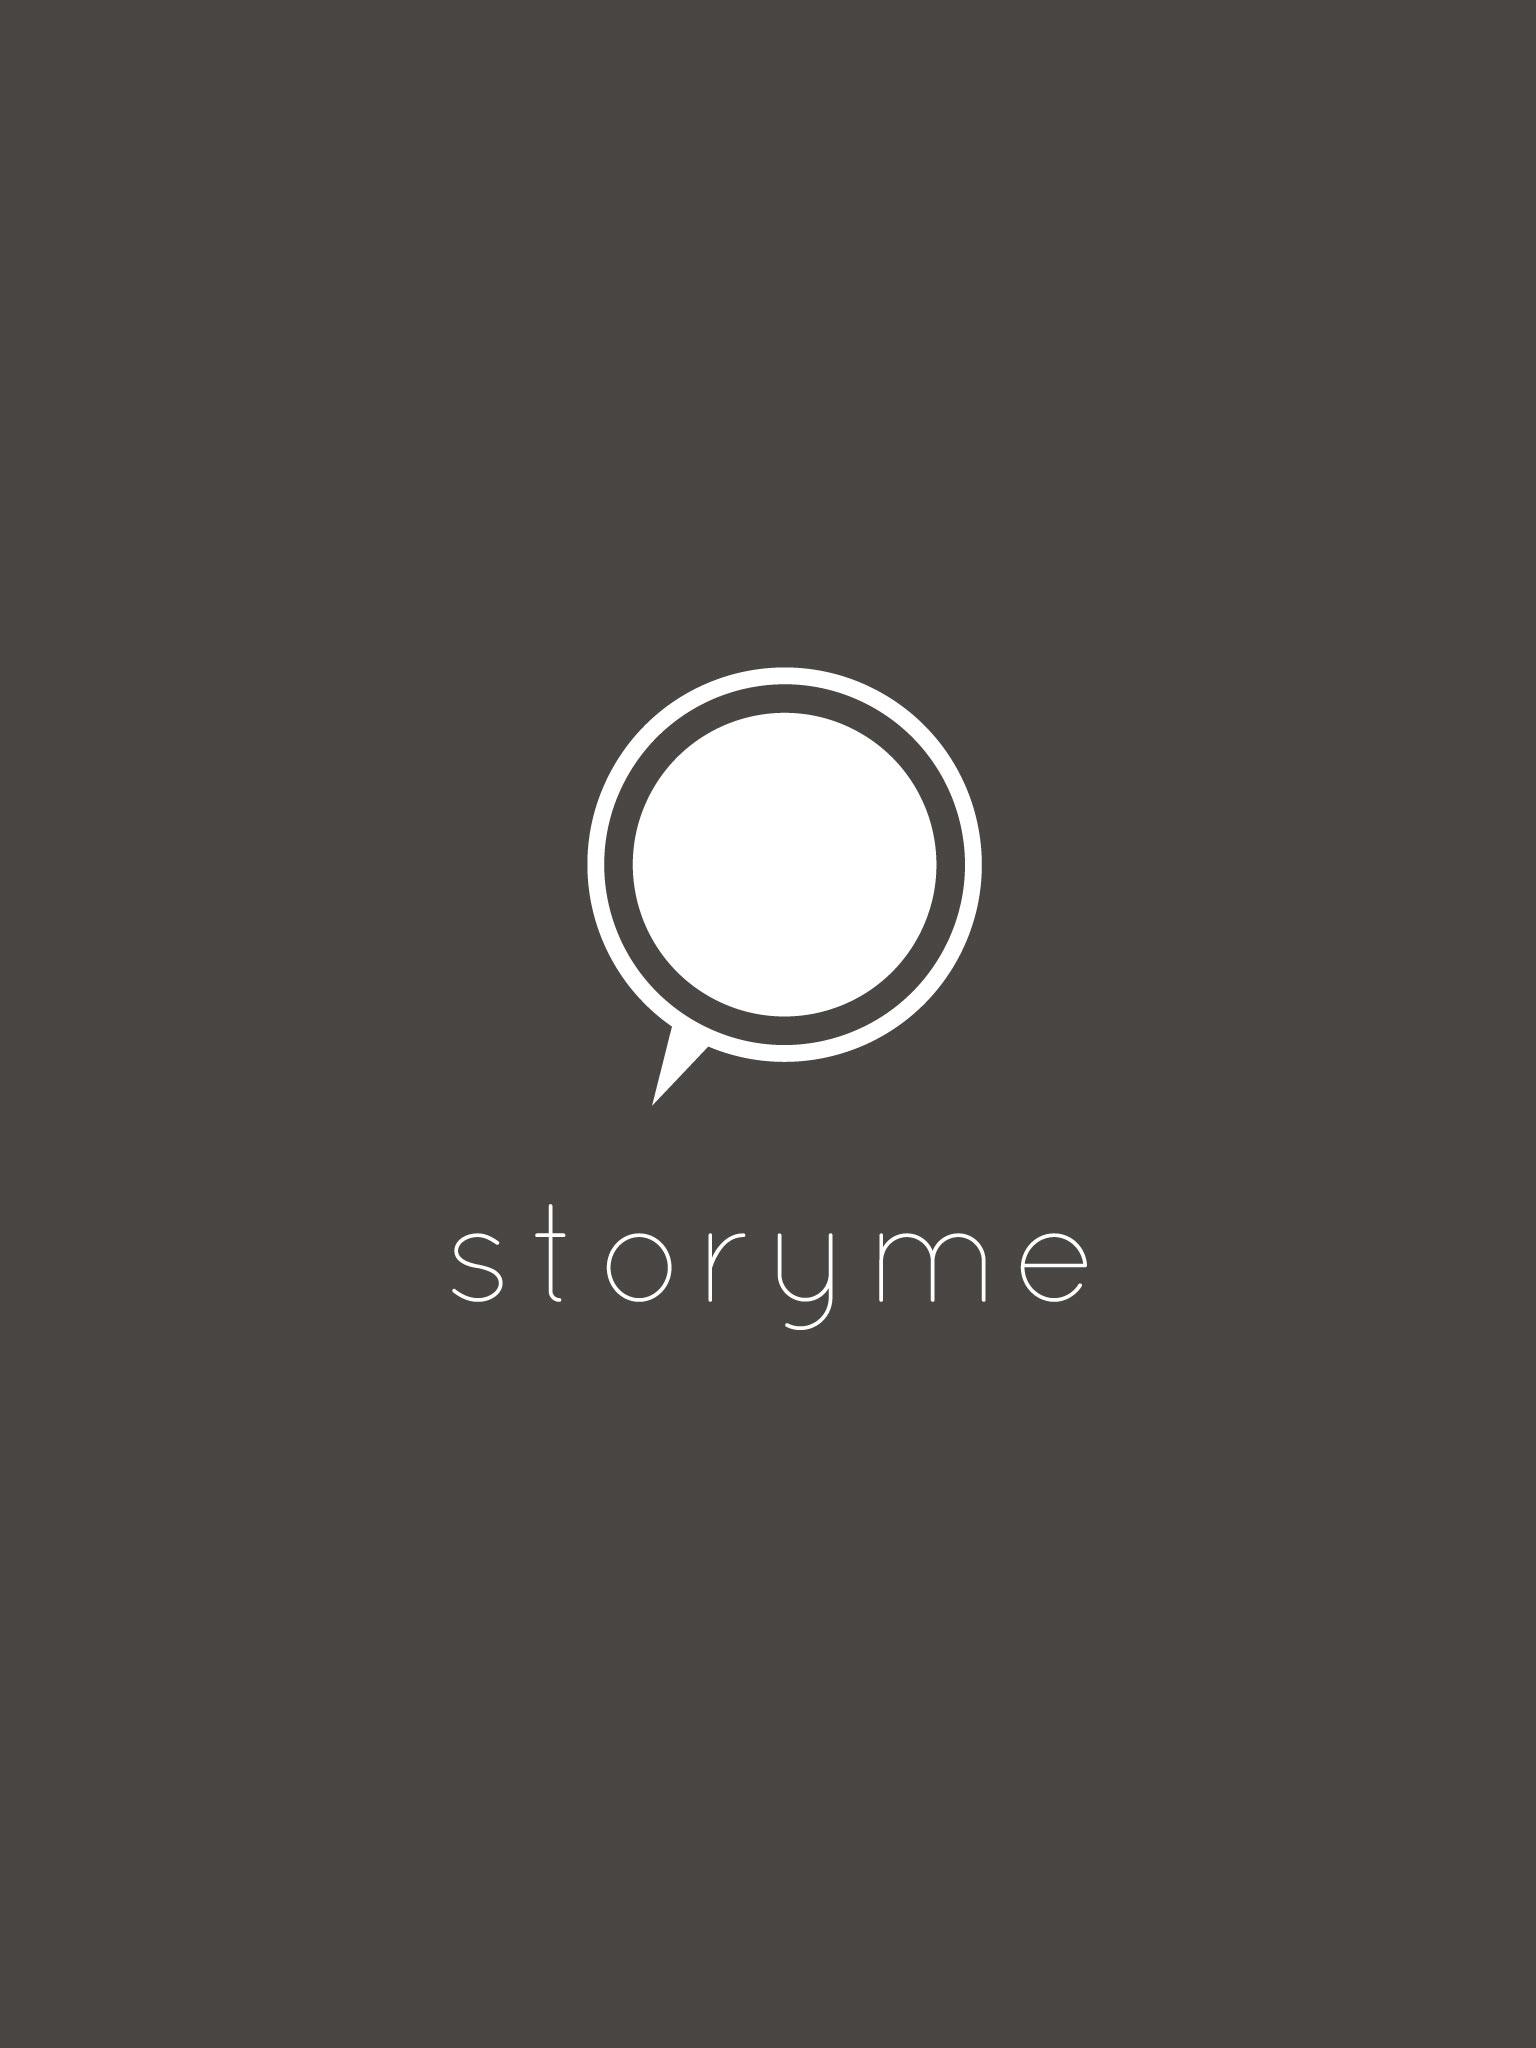 StoryMe_Logo.jpg